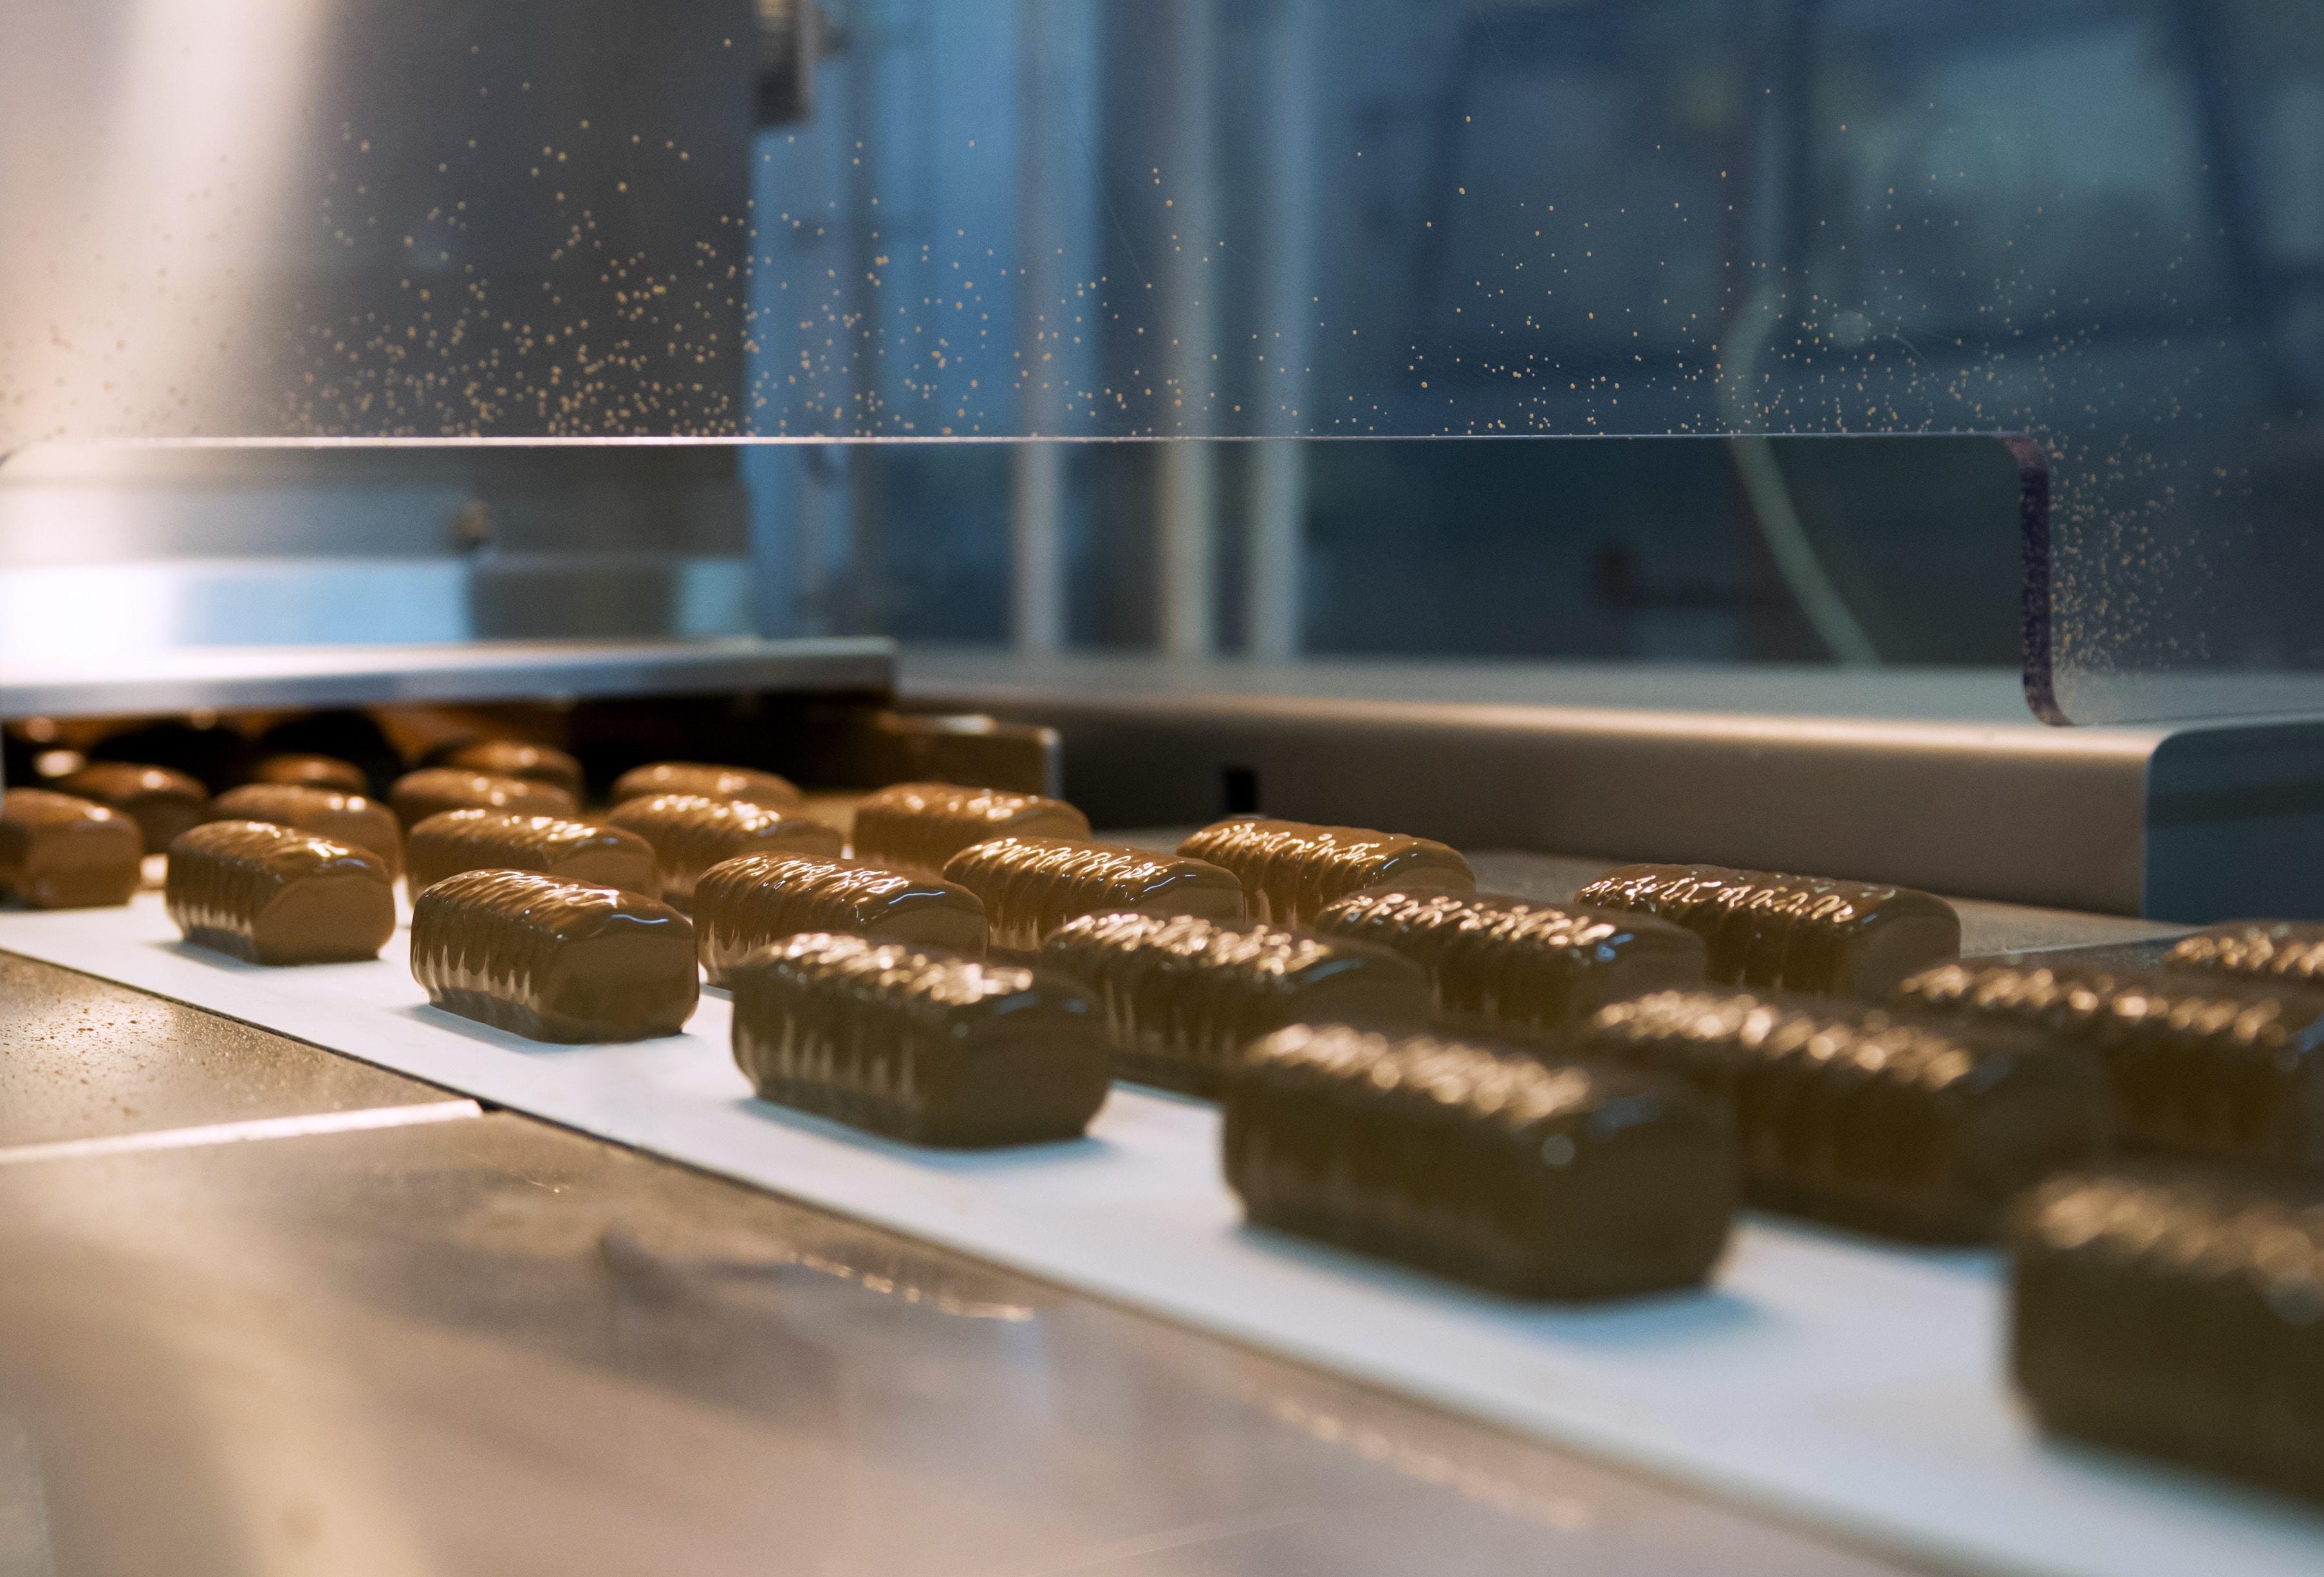 Wan-Vit company produces sweet since 1993.